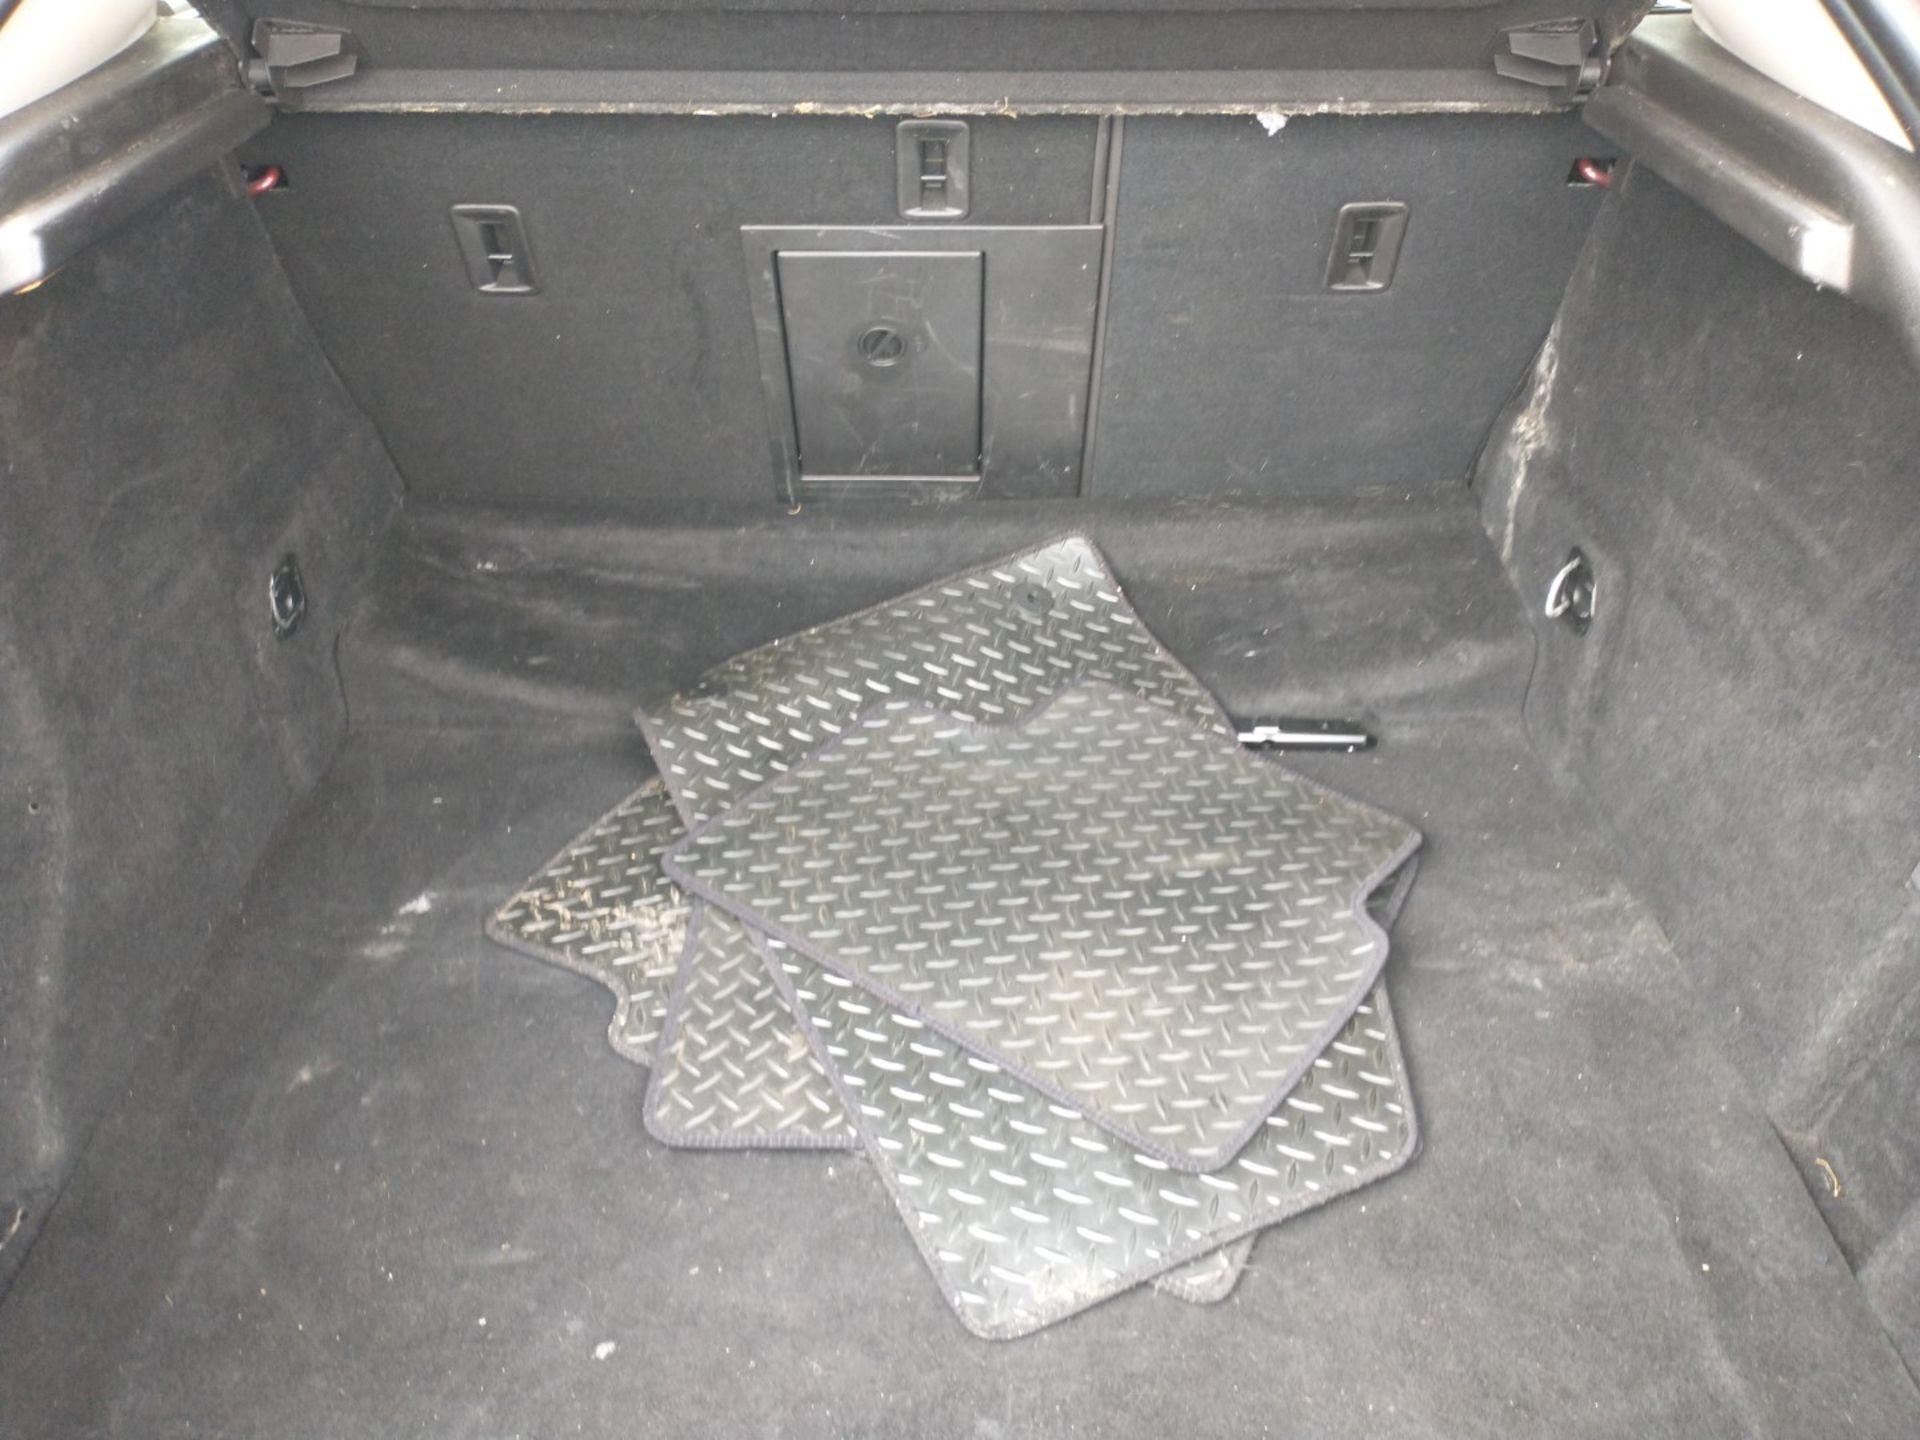 2009 Vauxhall Insignia Elite Nav CDTI 5dr 2.0 Diesel - CL505 - NO VAT ON THE HAMMER - Location: Corb - Image 12 of 22